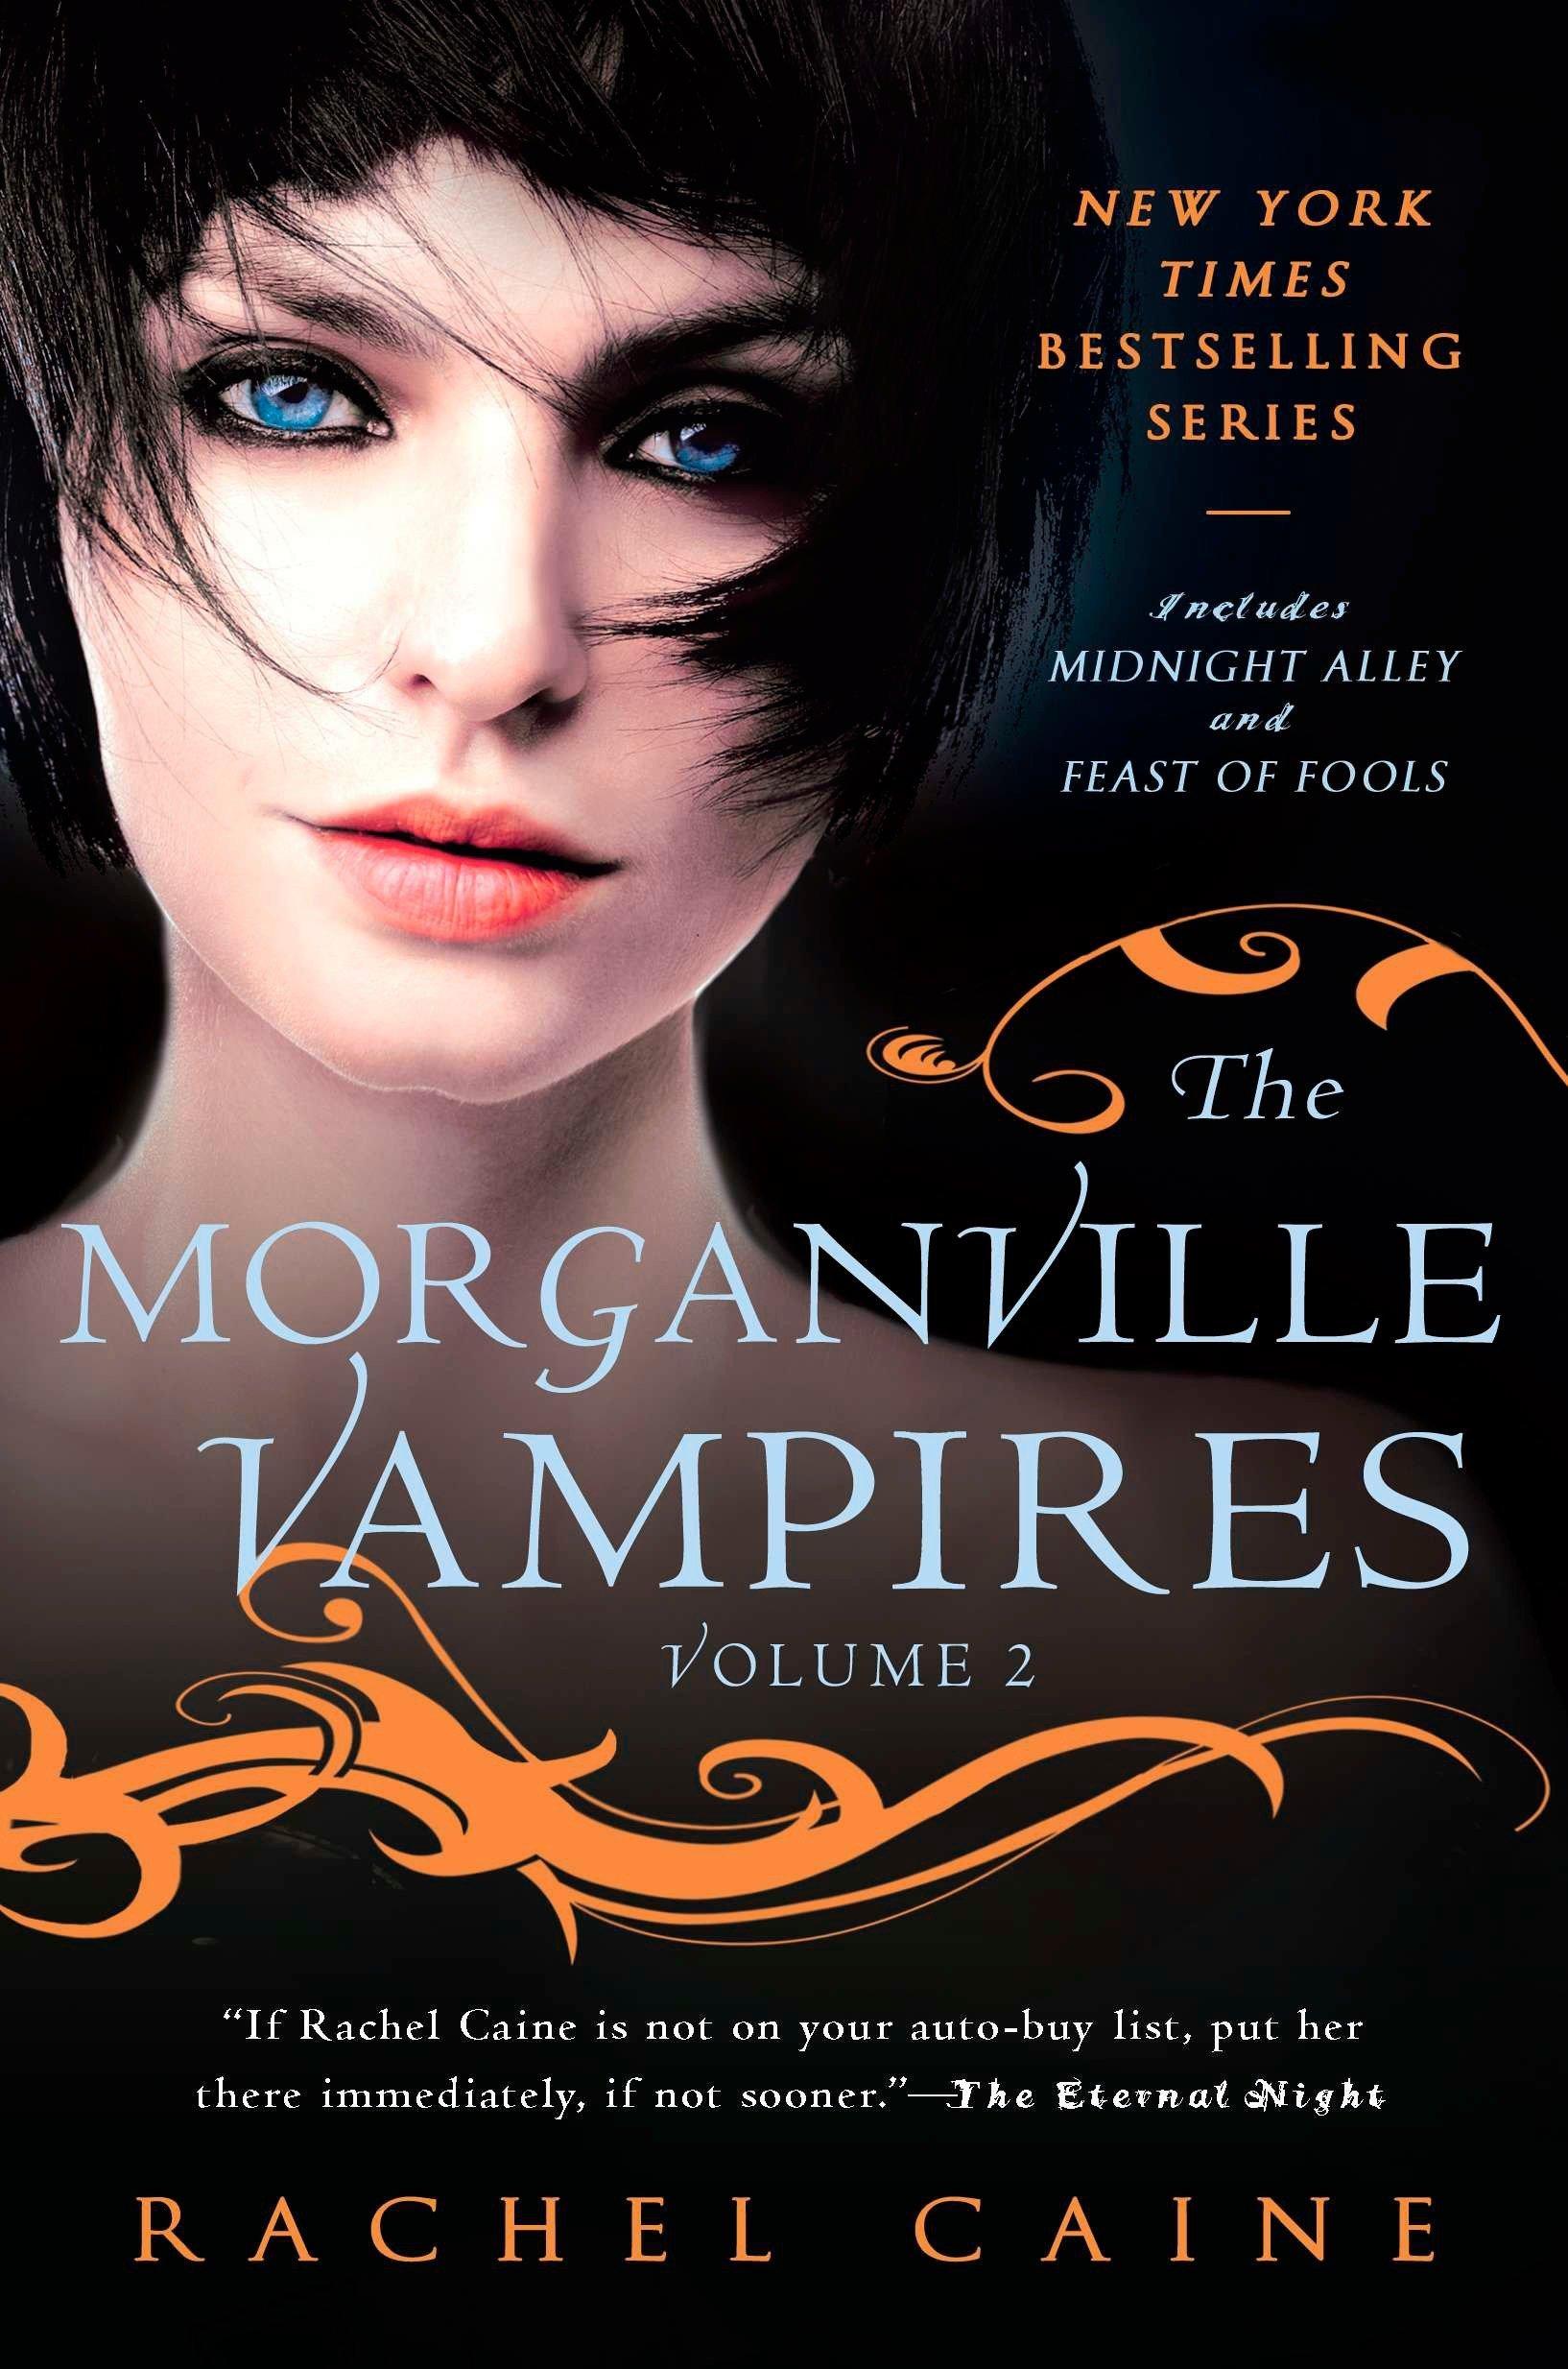 Read Online The Morganville Vampires, Vol. 2 (Midnight Alley / Feast of Fools) ebook